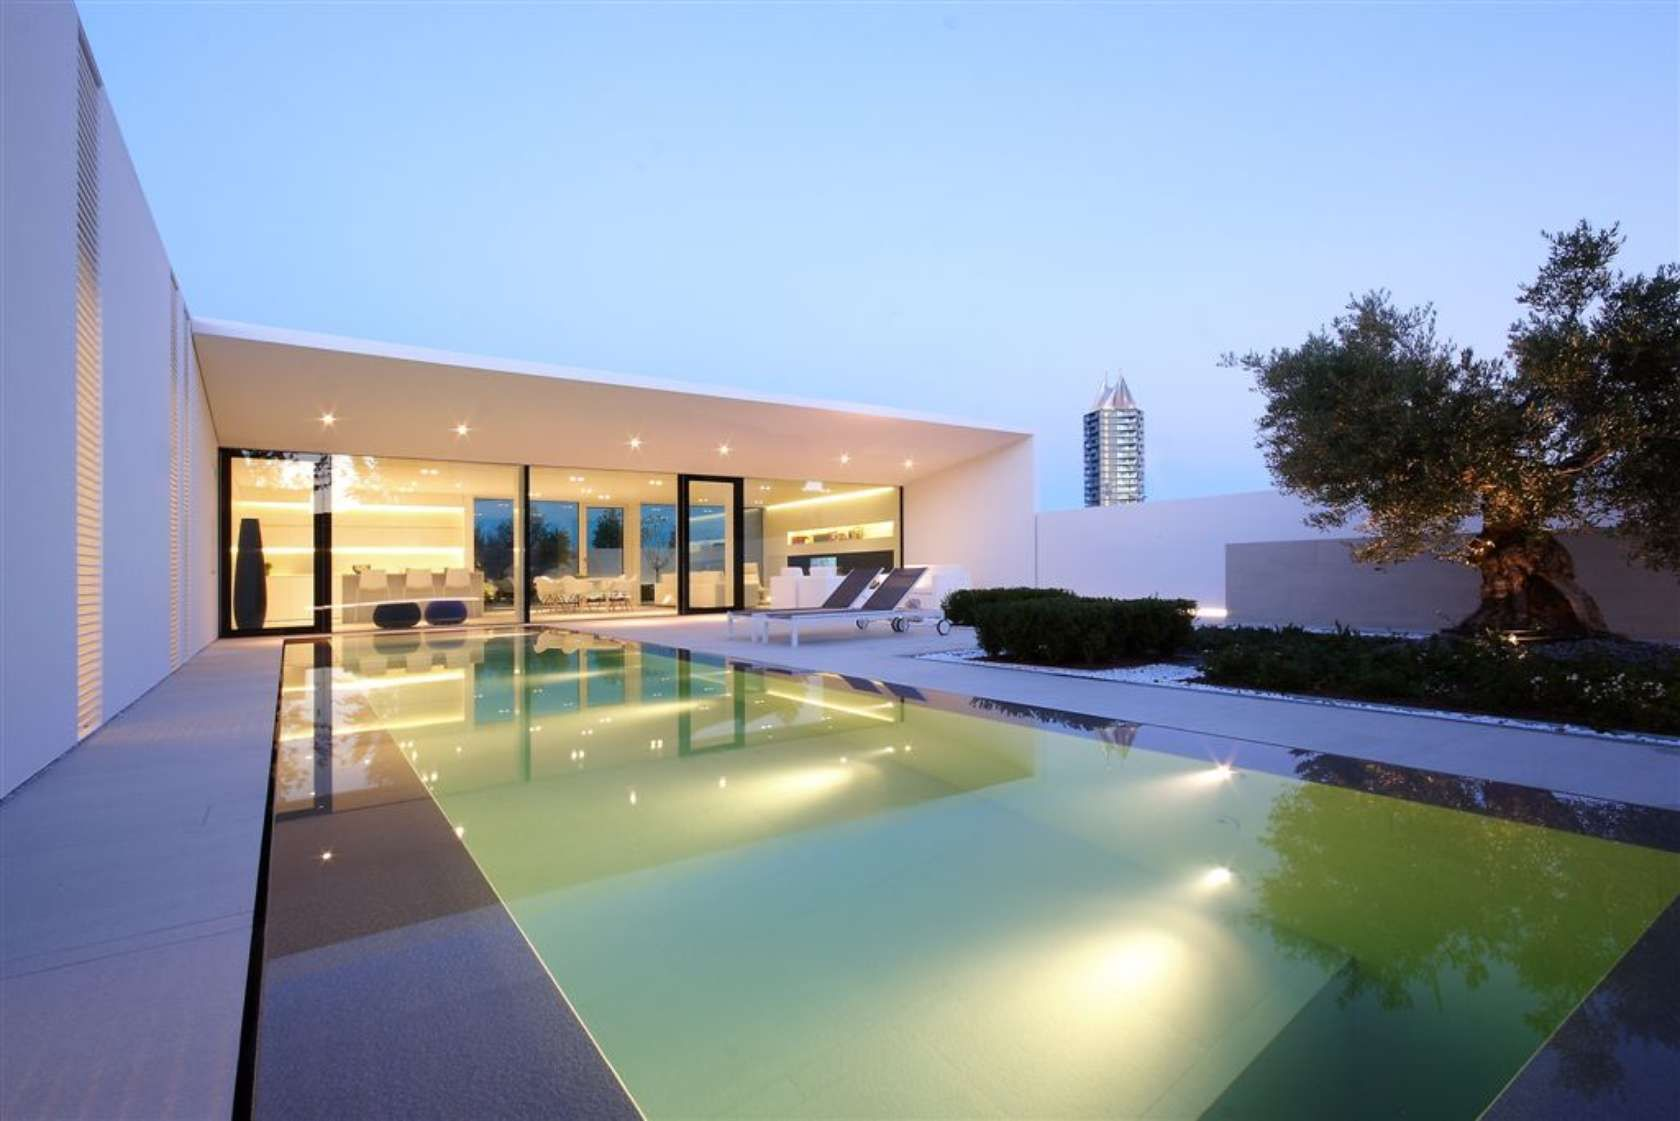 Jesolo Lido Pool Villa on Architizer Jesolo